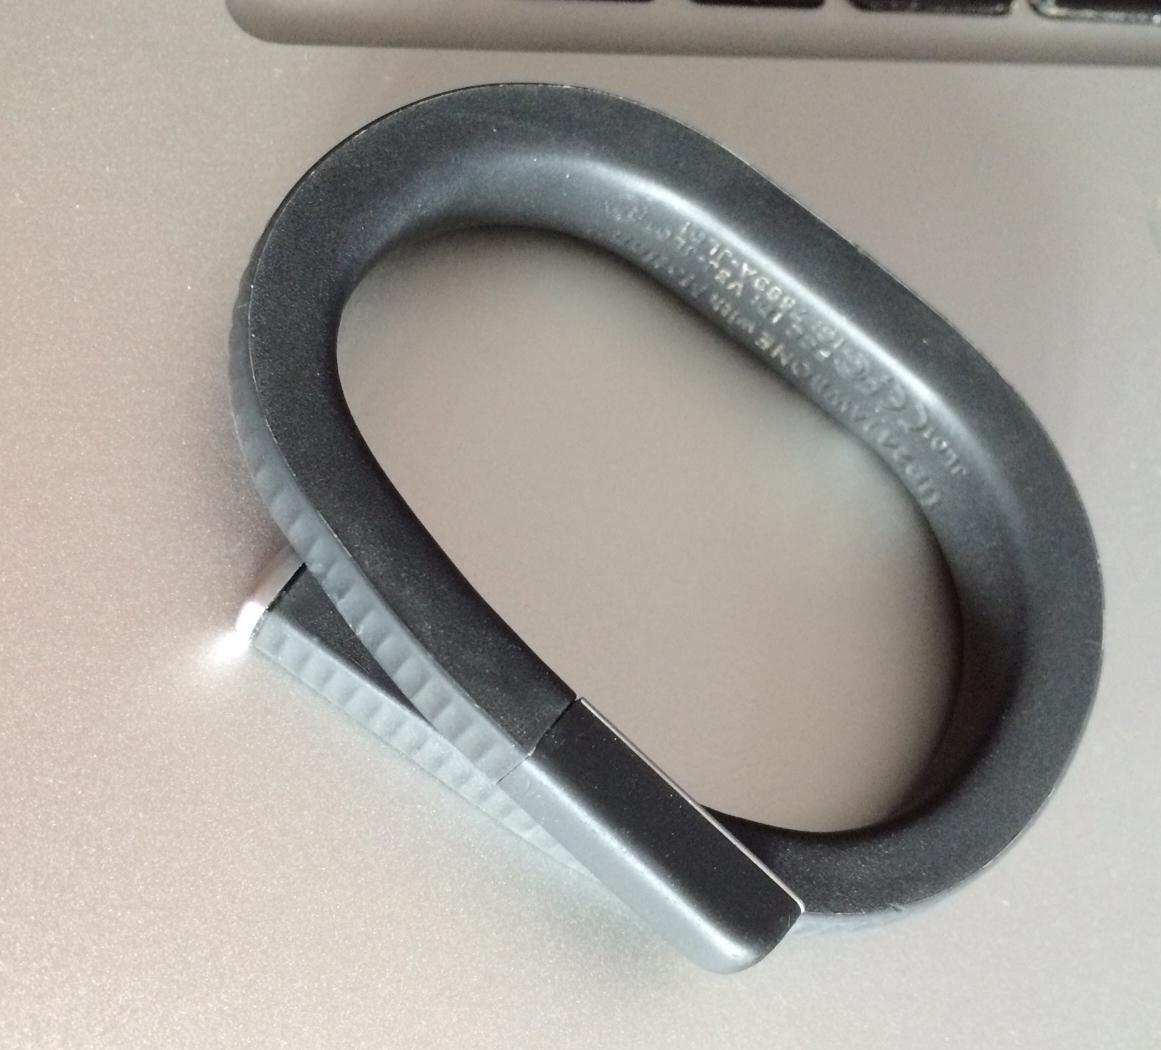 jawbone & company